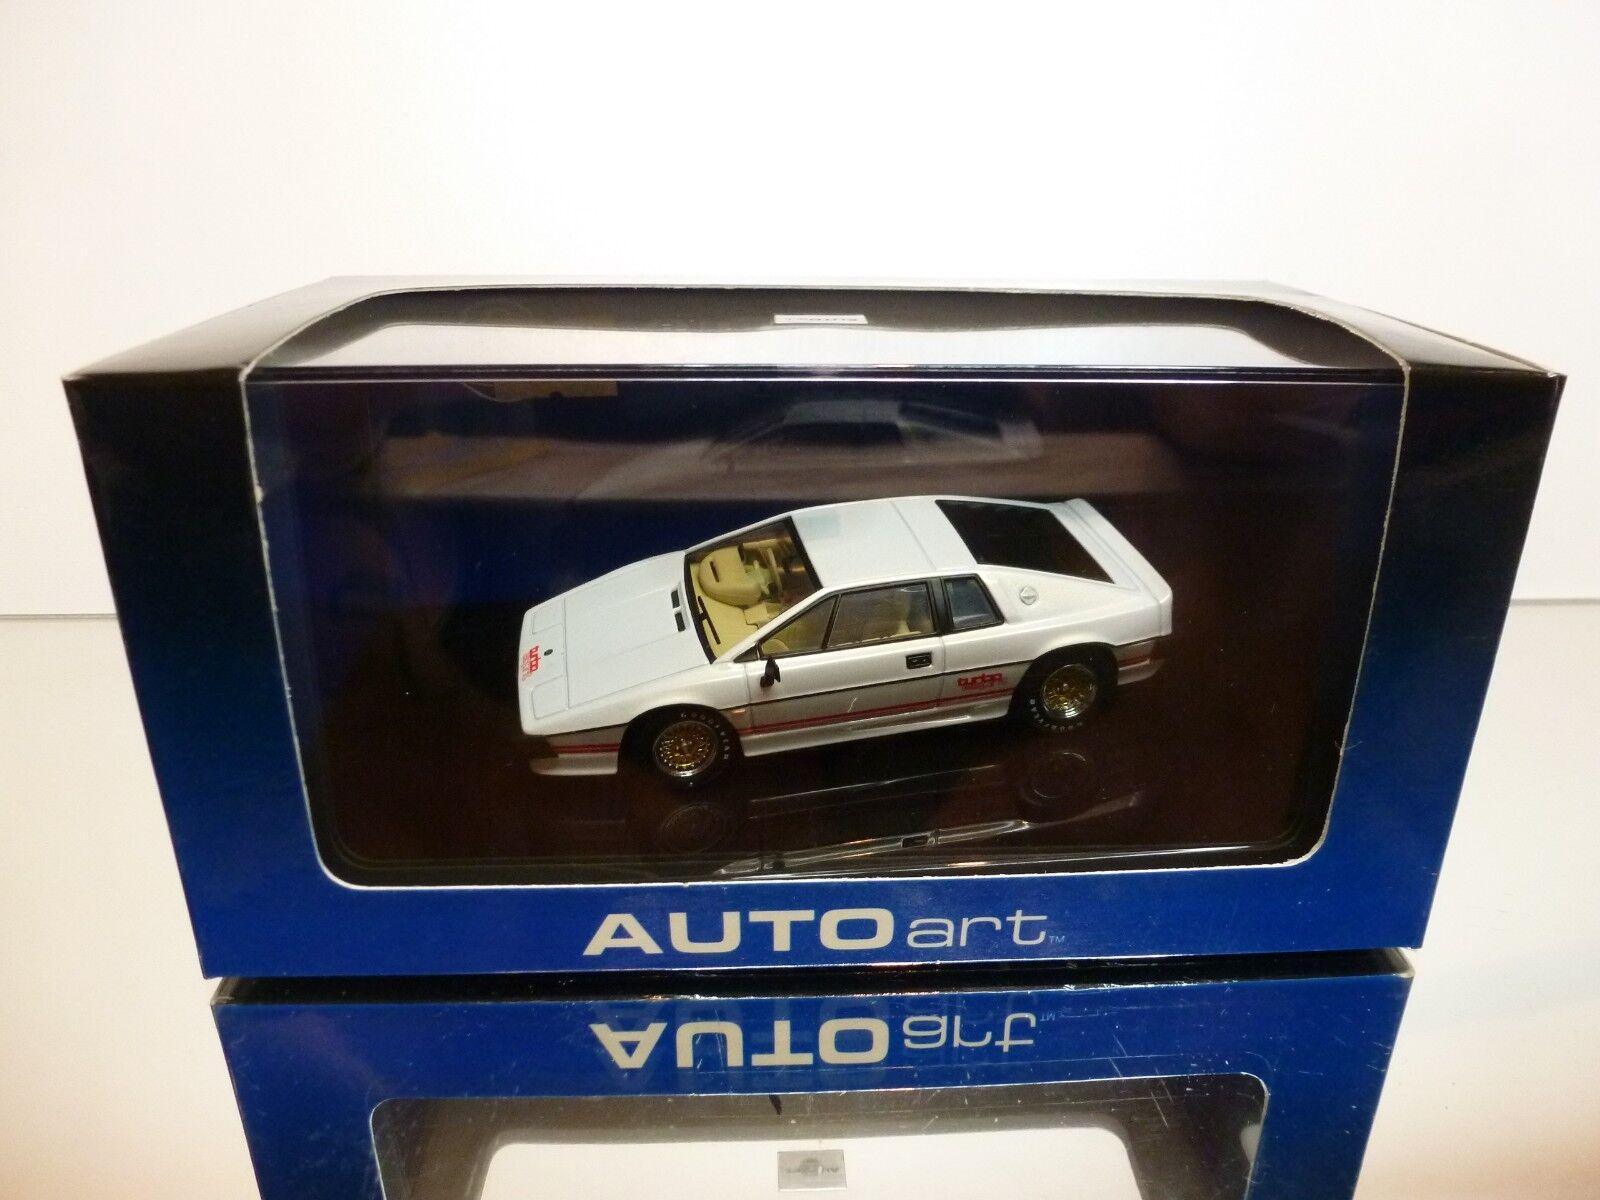 AUTOART 55301 LOTUS ESPRIT TURBO  - PEARL blanc 1 43 - EXCELLENT IN BOX